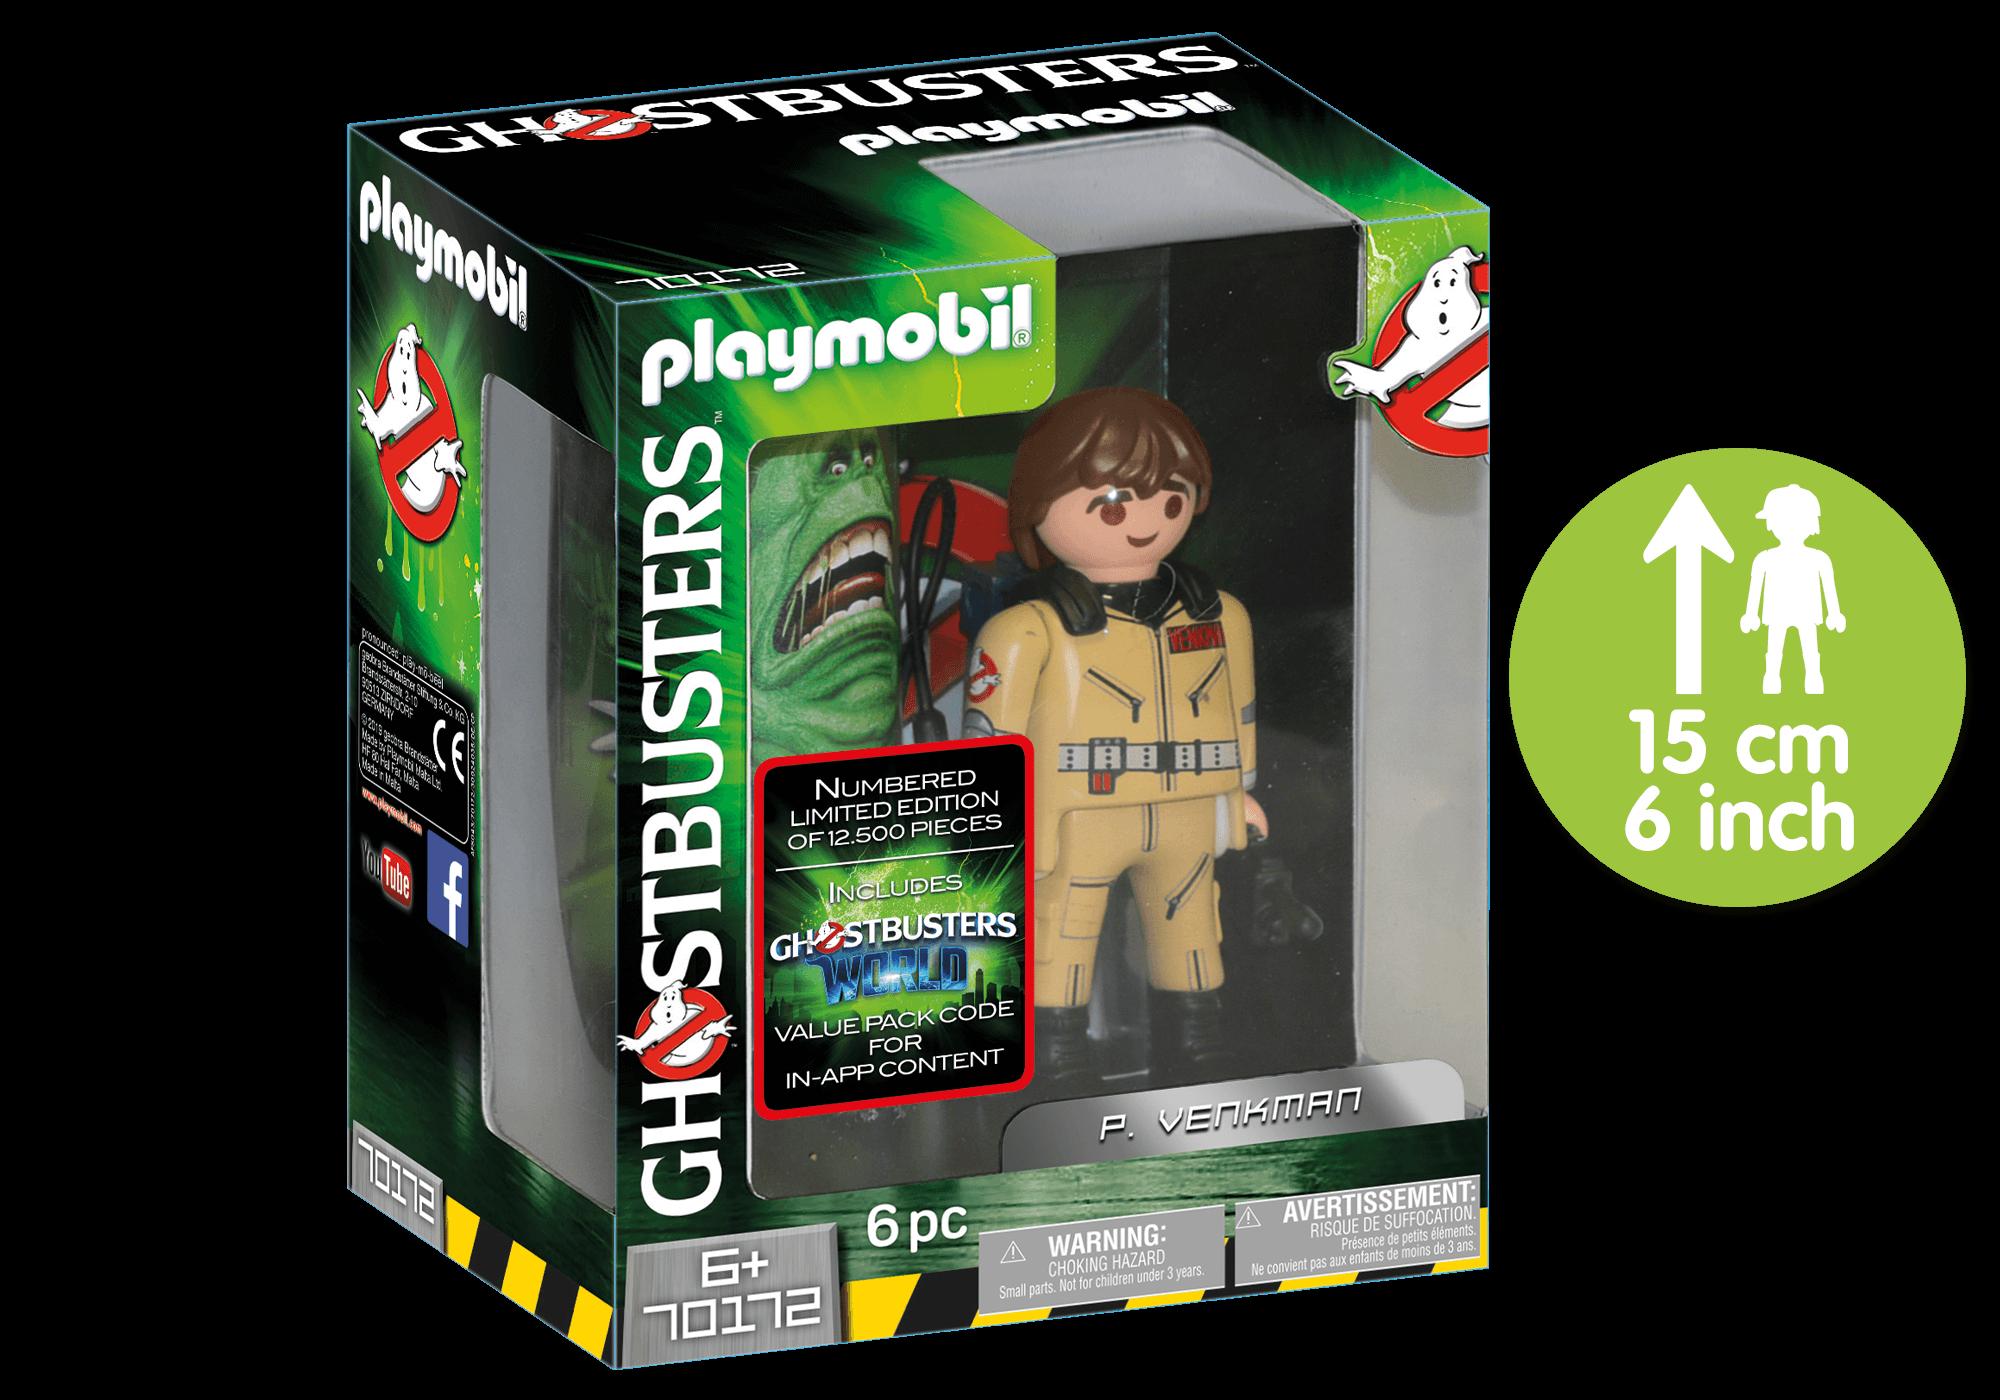 http://media.playmobil.com/i/playmobil/70172_product_detail/Ghostbusters™ Figurka do kolekcjonowania P. Venkman